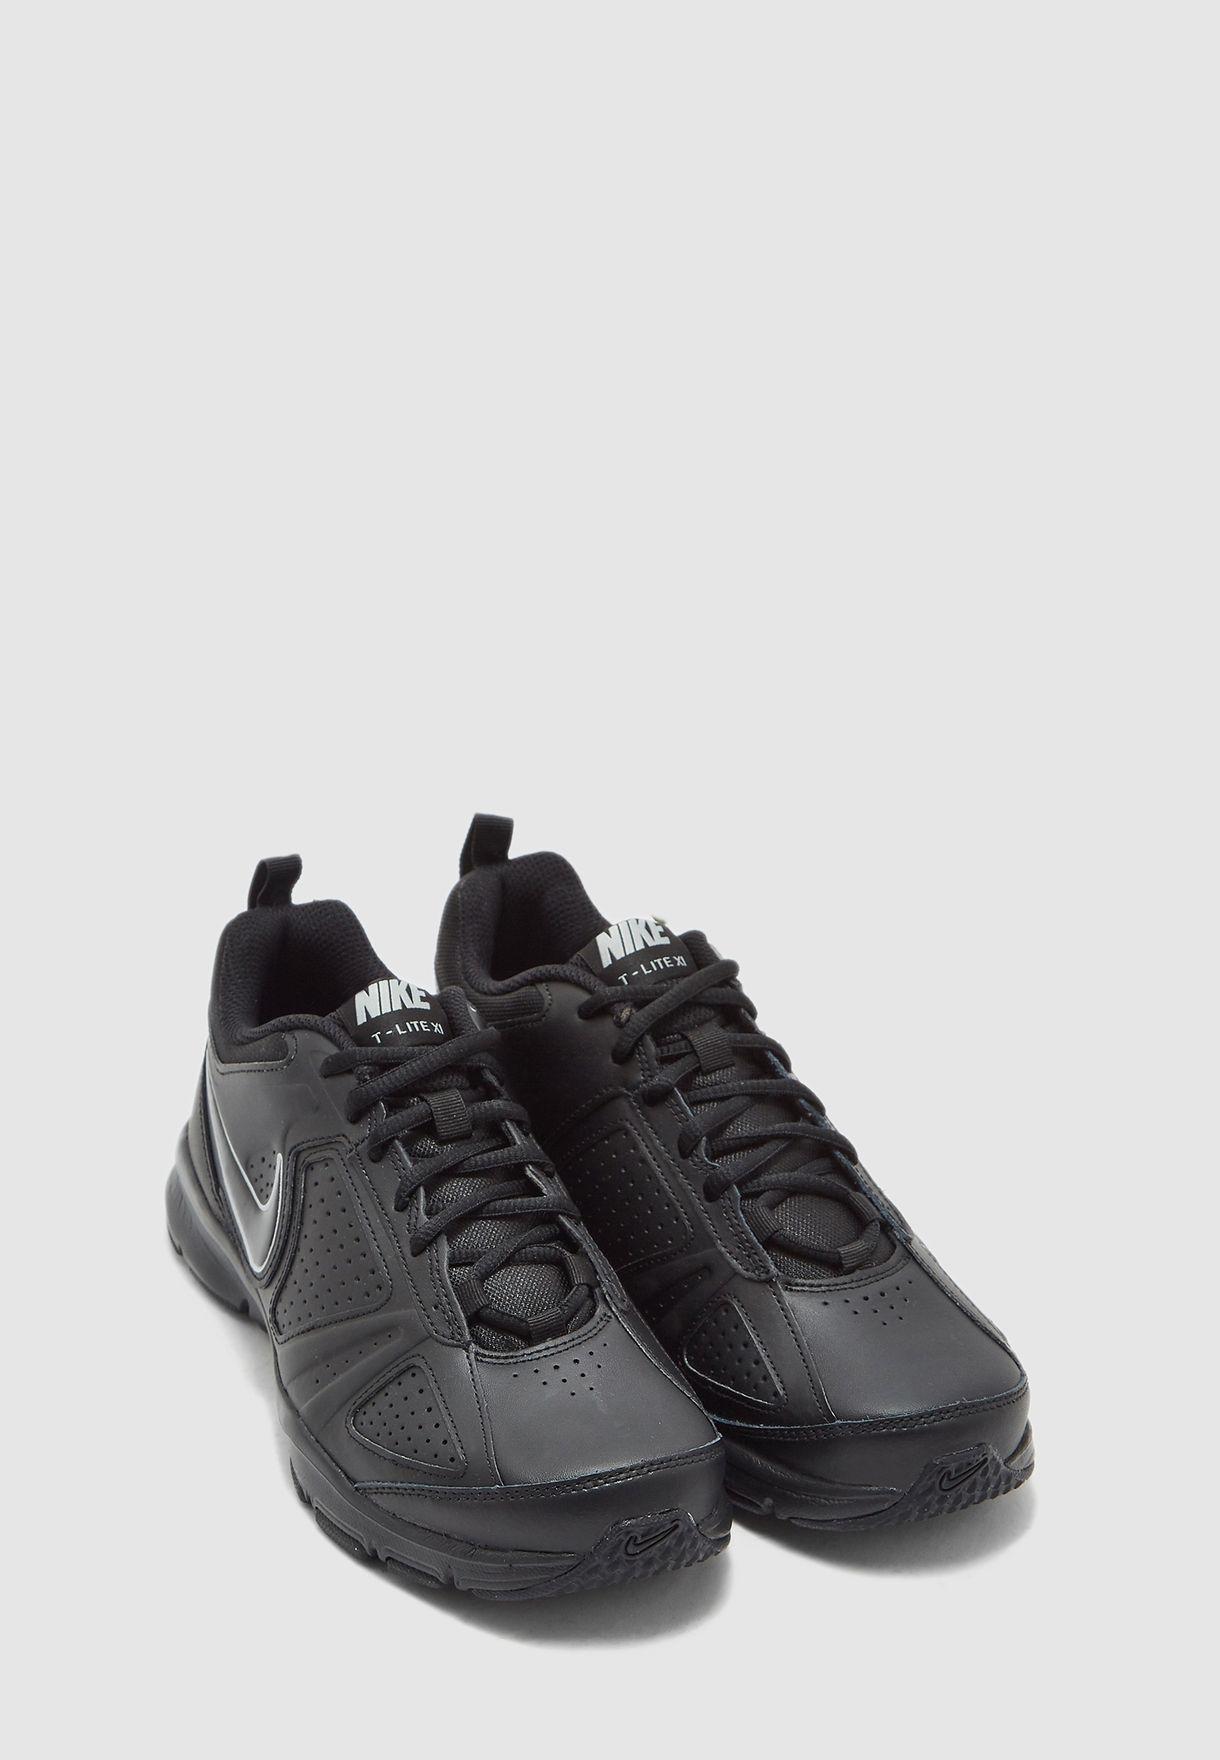 Nike T Lite XI Mens White Lthr Crosstrainer Shoes 616544 100 NWD Size 6 15 M